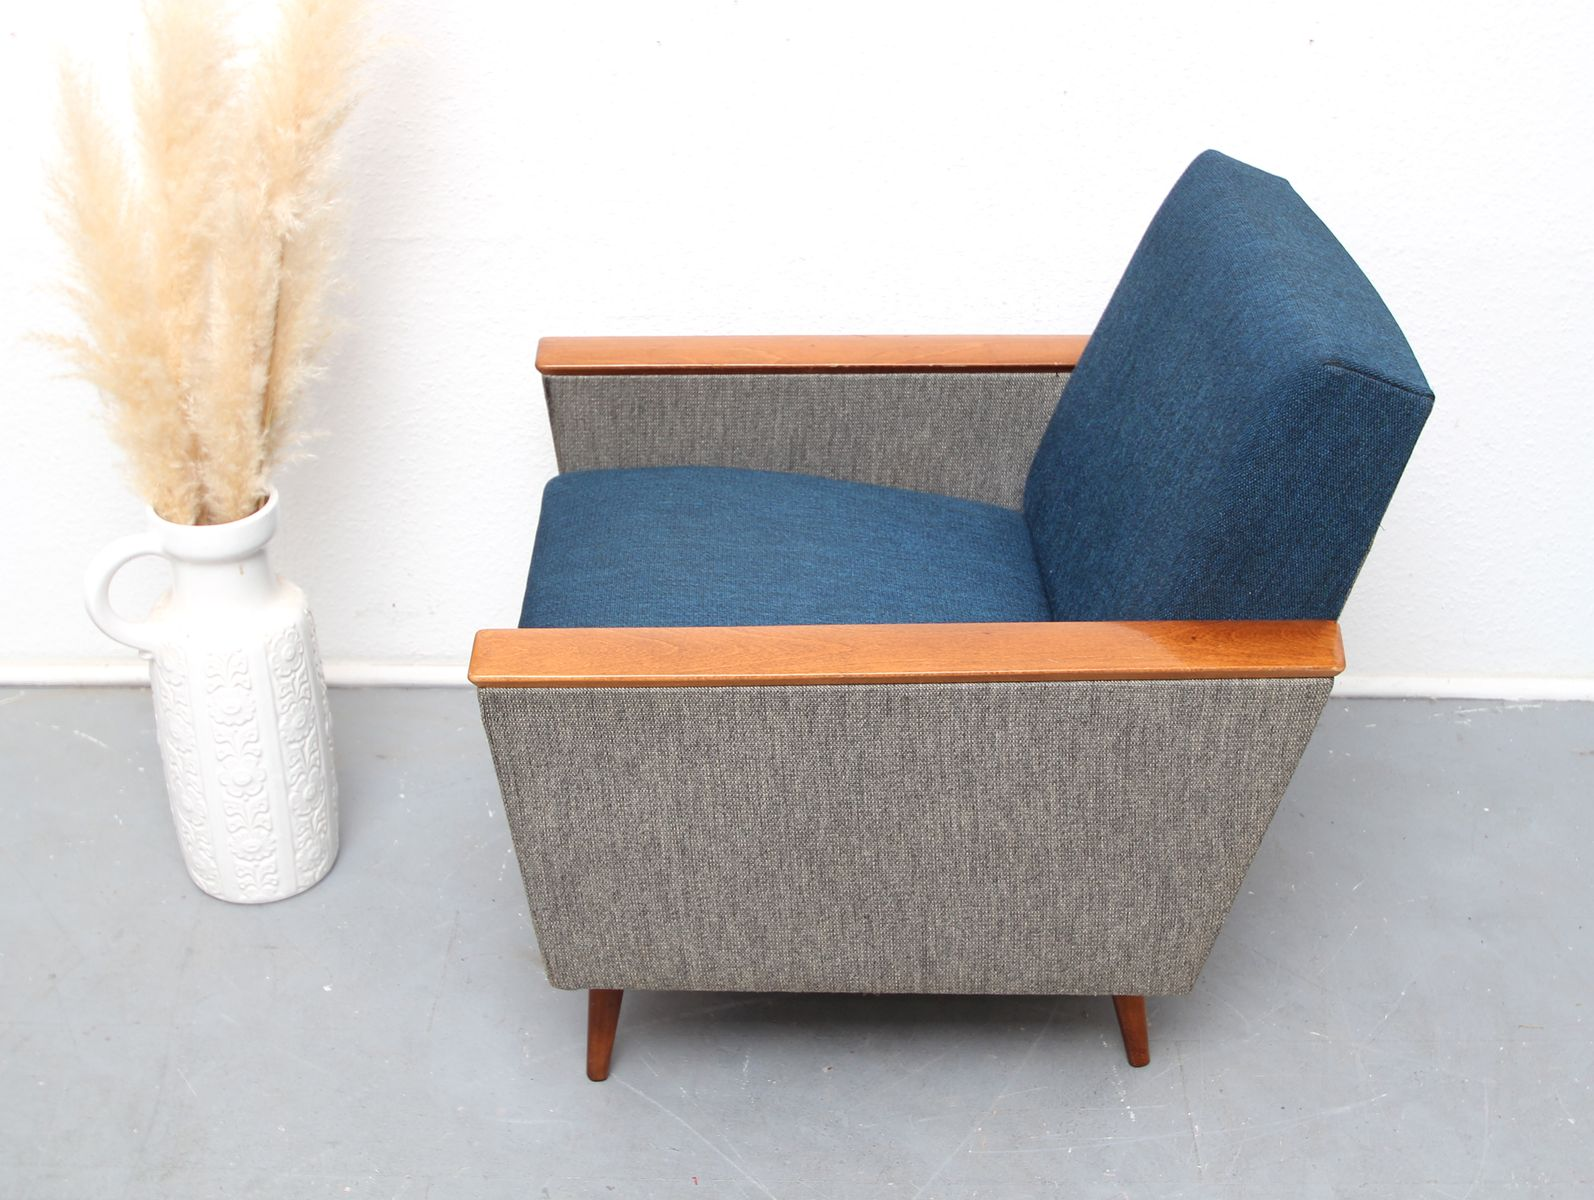 grau blauer vintage sessel bei pamono kaufen. Black Bedroom Furniture Sets. Home Design Ideas